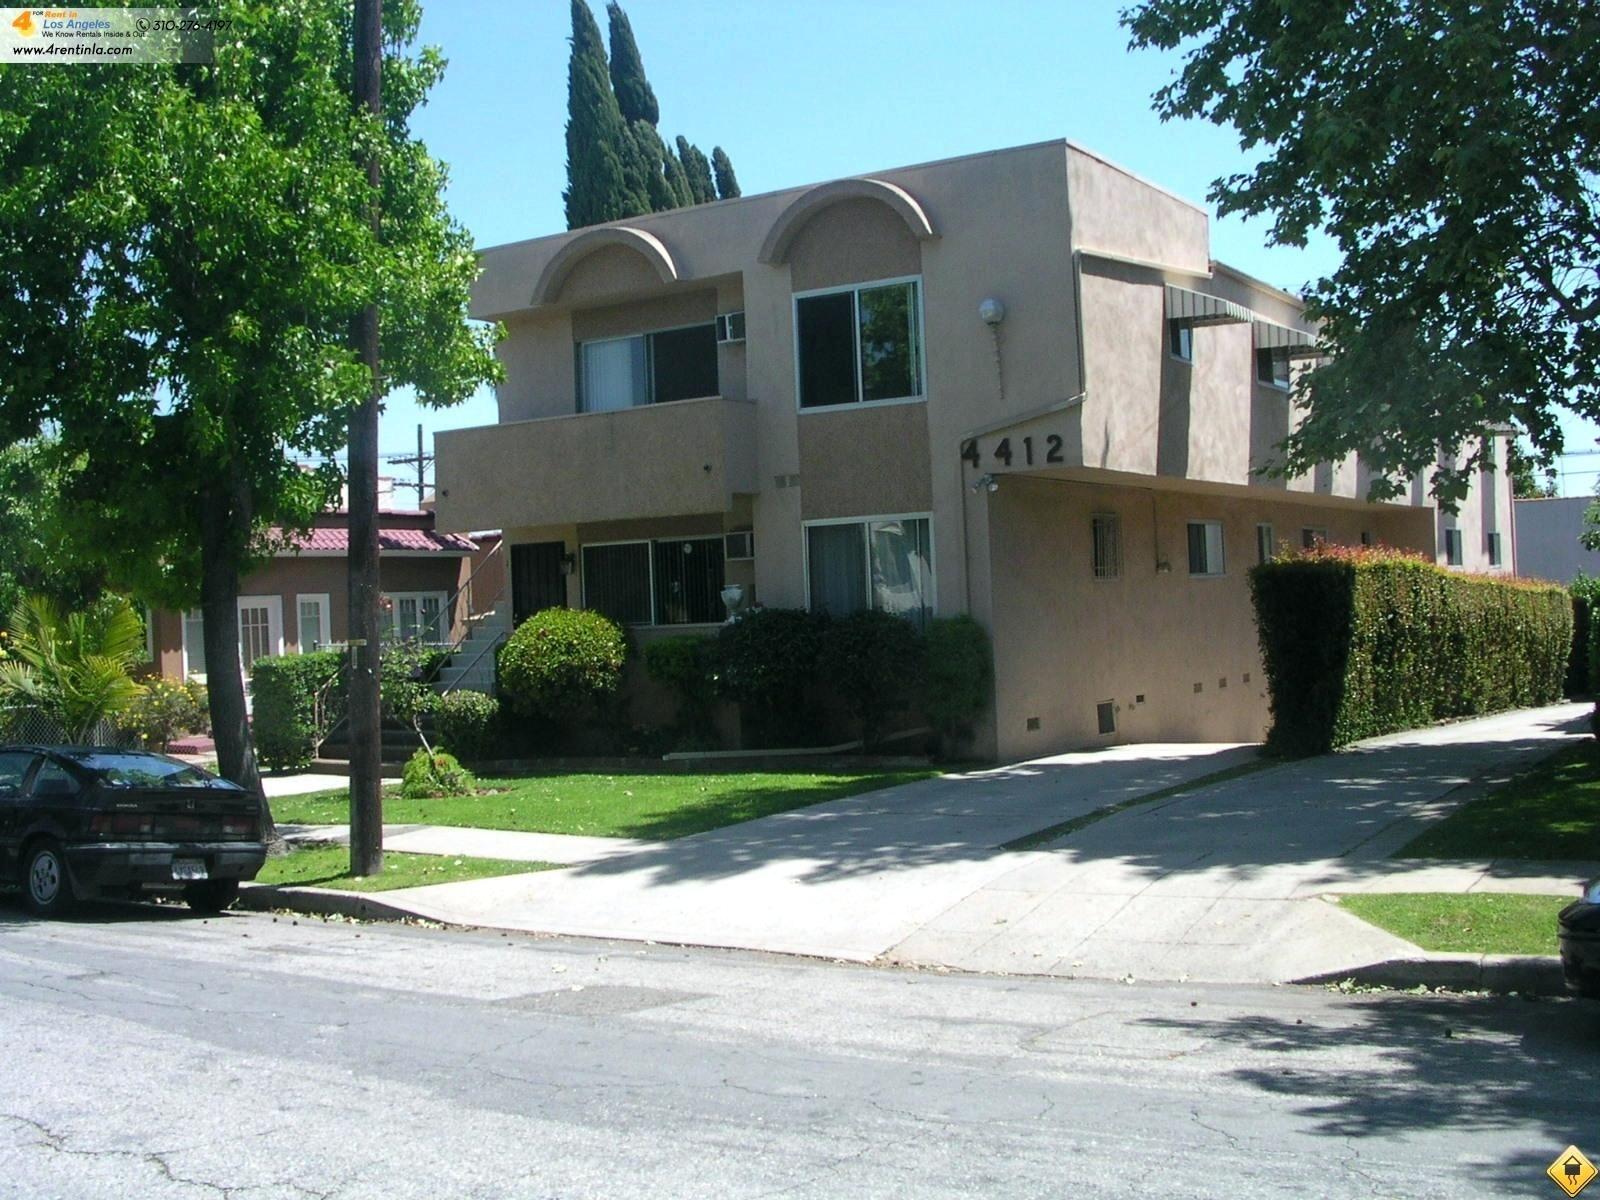 Craigslist 1 bedroom apartments for rent 1 bedroom